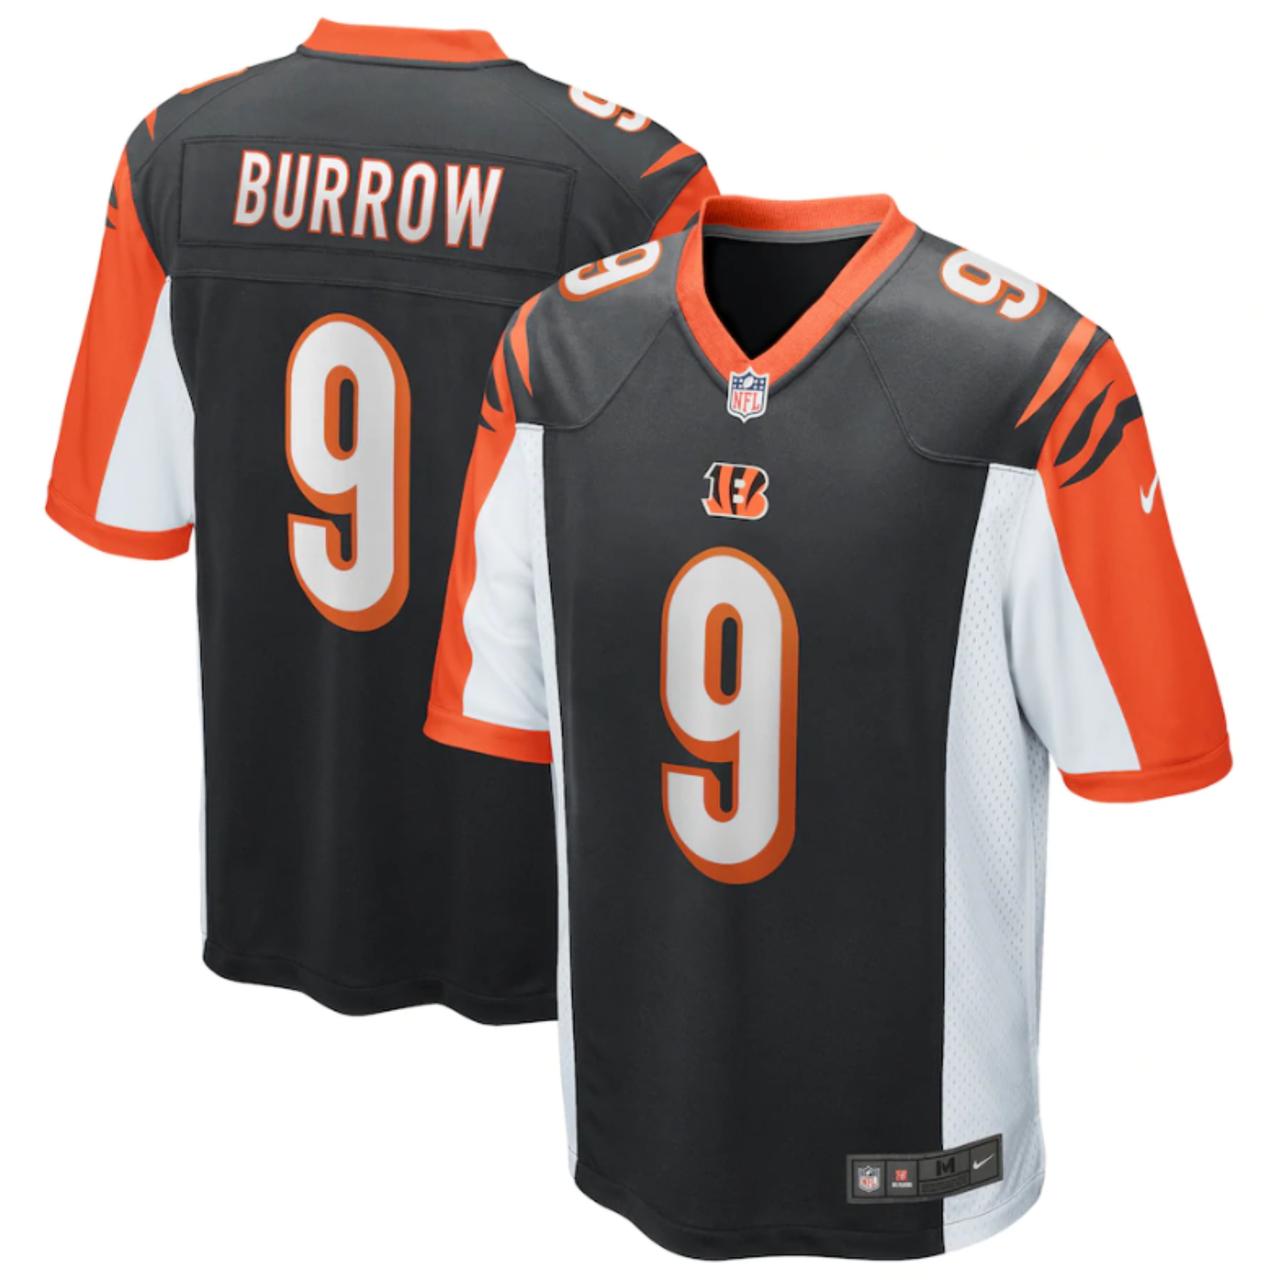 Joe Burrow Youth Cincinnati Bengals Nike 2020 NFL Draft First Round Pick Game Jersey - Black